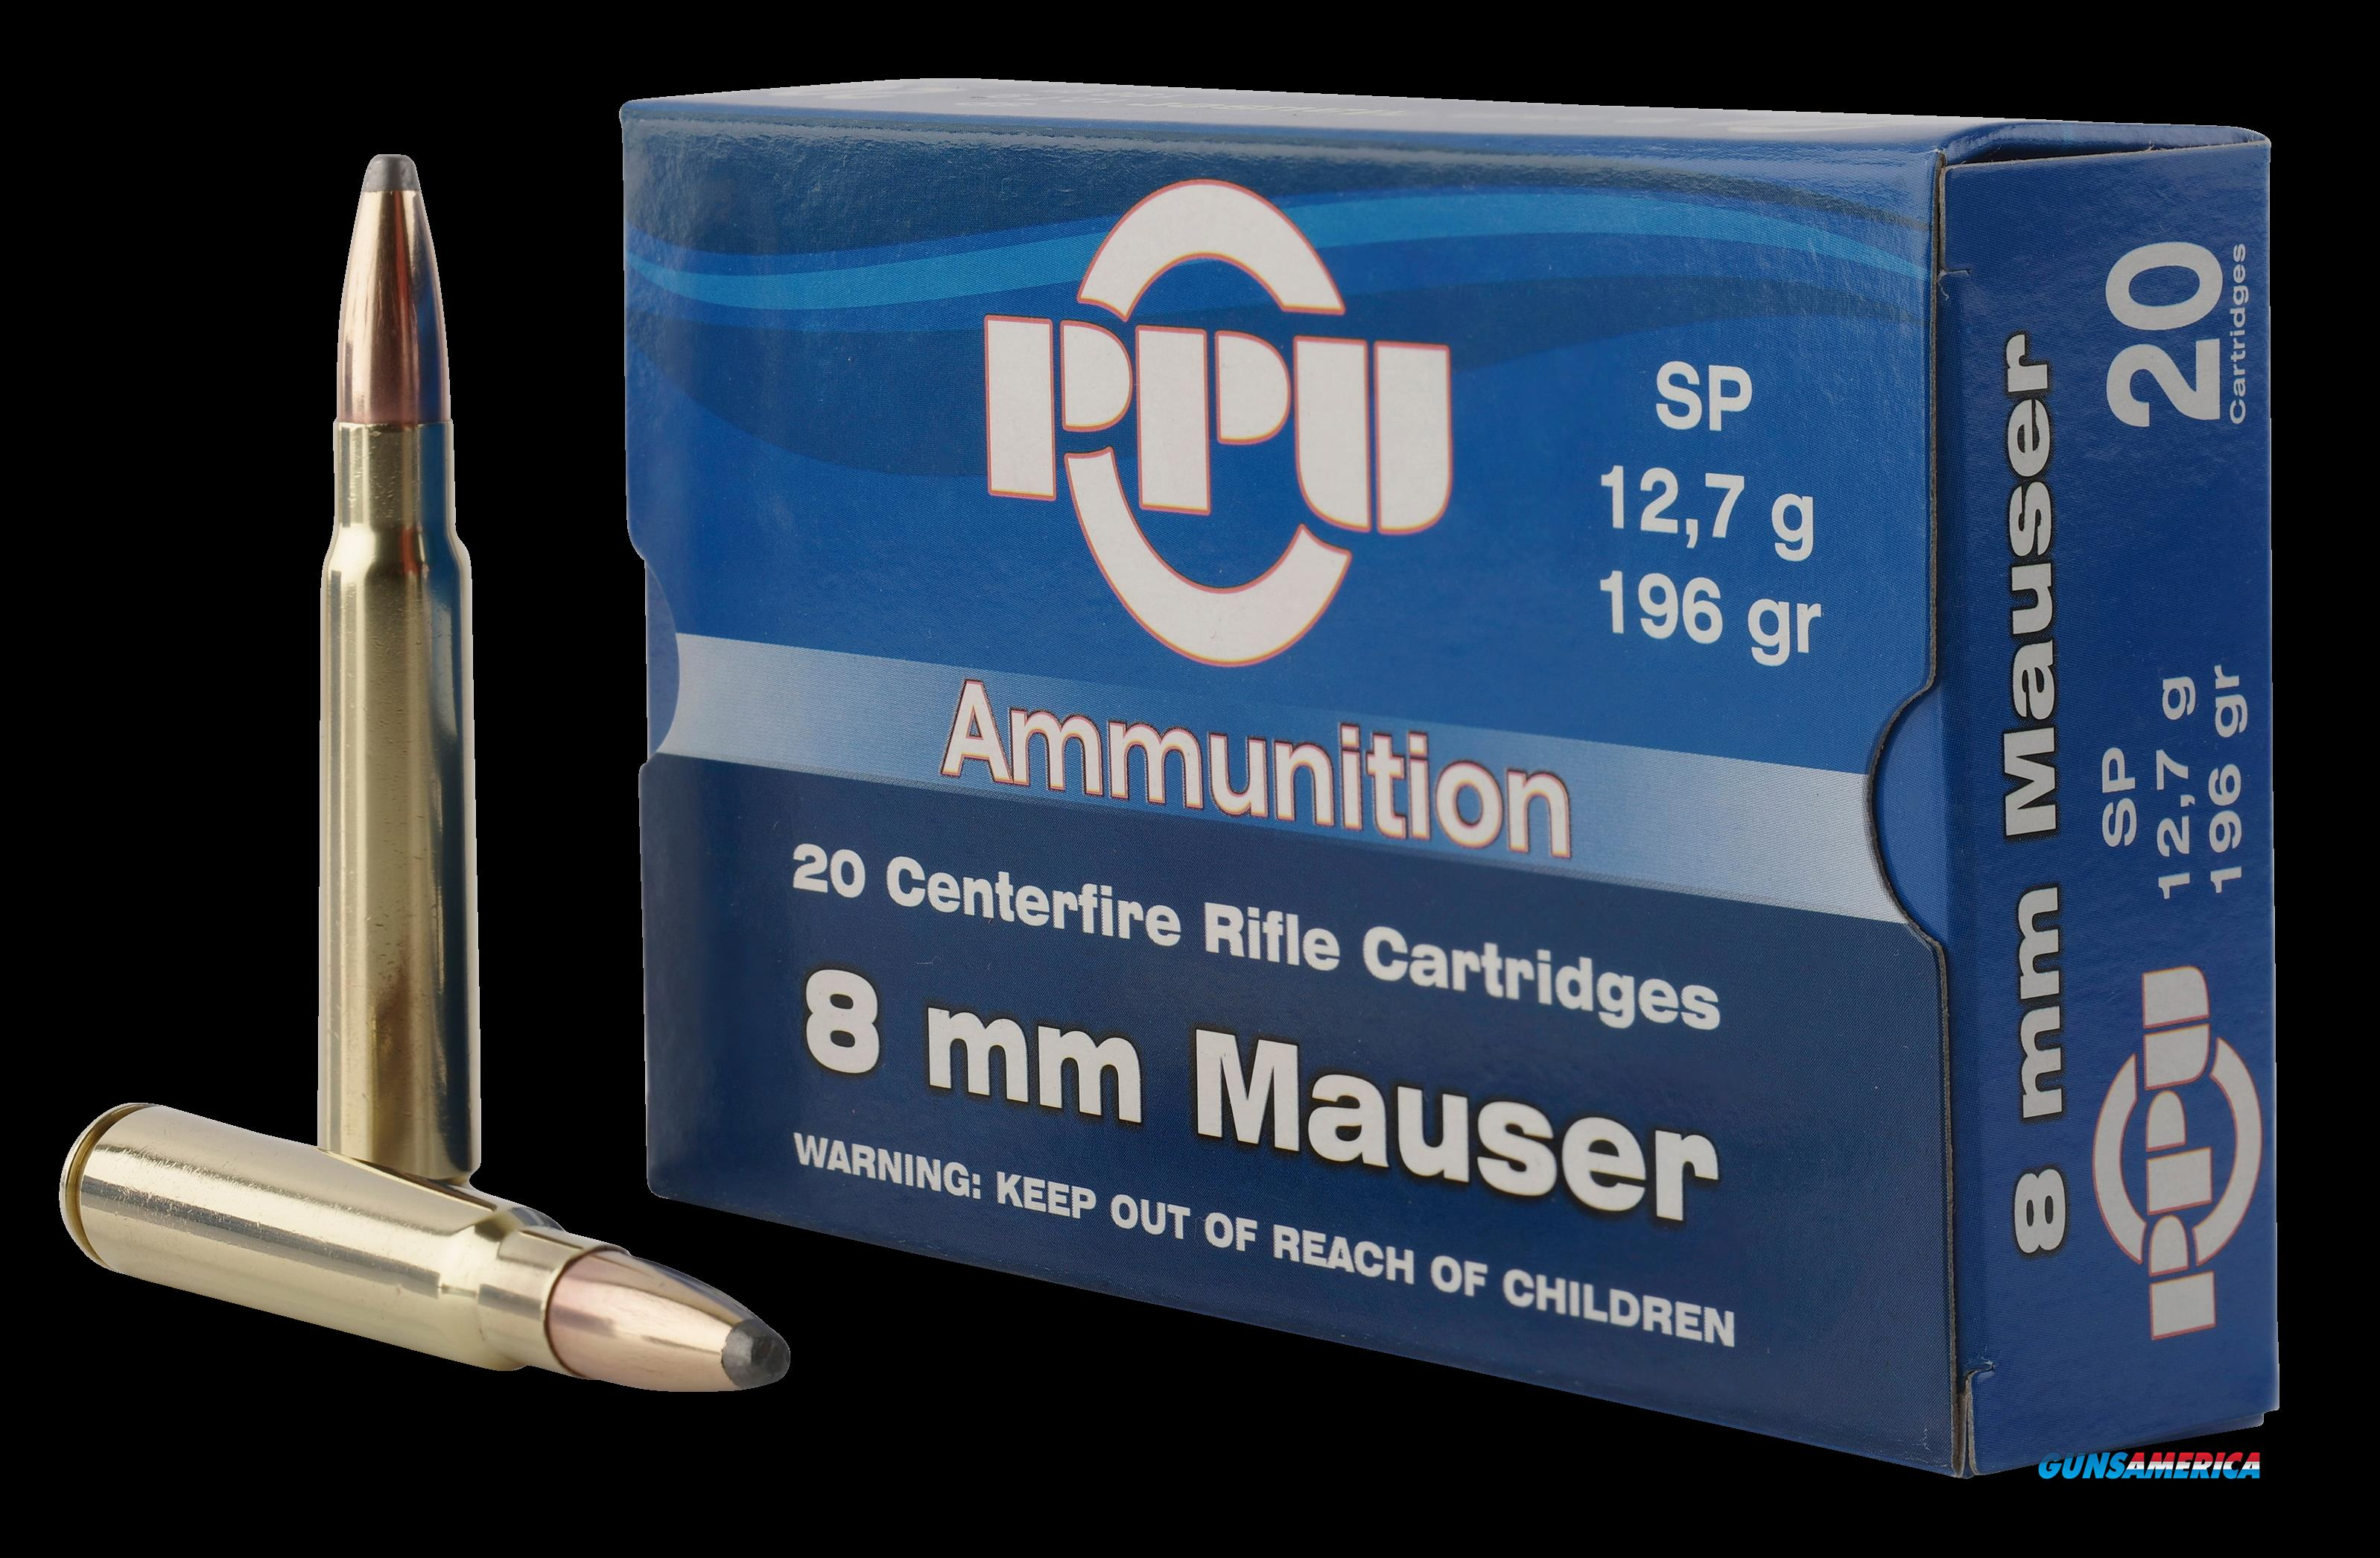 Ppu Metric Rifle, Ppu Pp8s        8mmmau      196 Sp           20-10  Guns > Pistols > 1911 Pistol Copies (non-Colt)